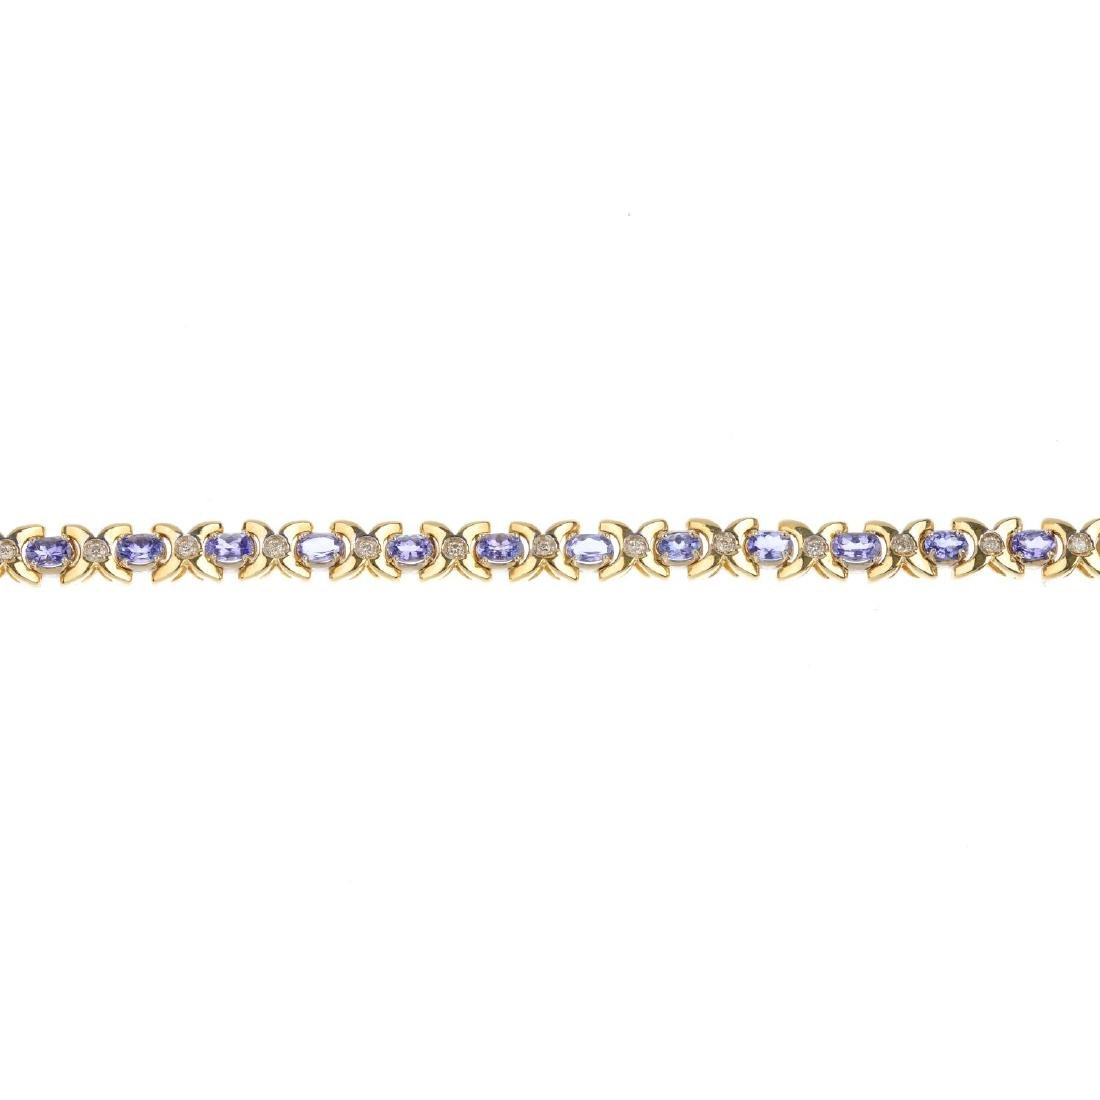 A tanzanite and diamond bracelet. Designed as a series